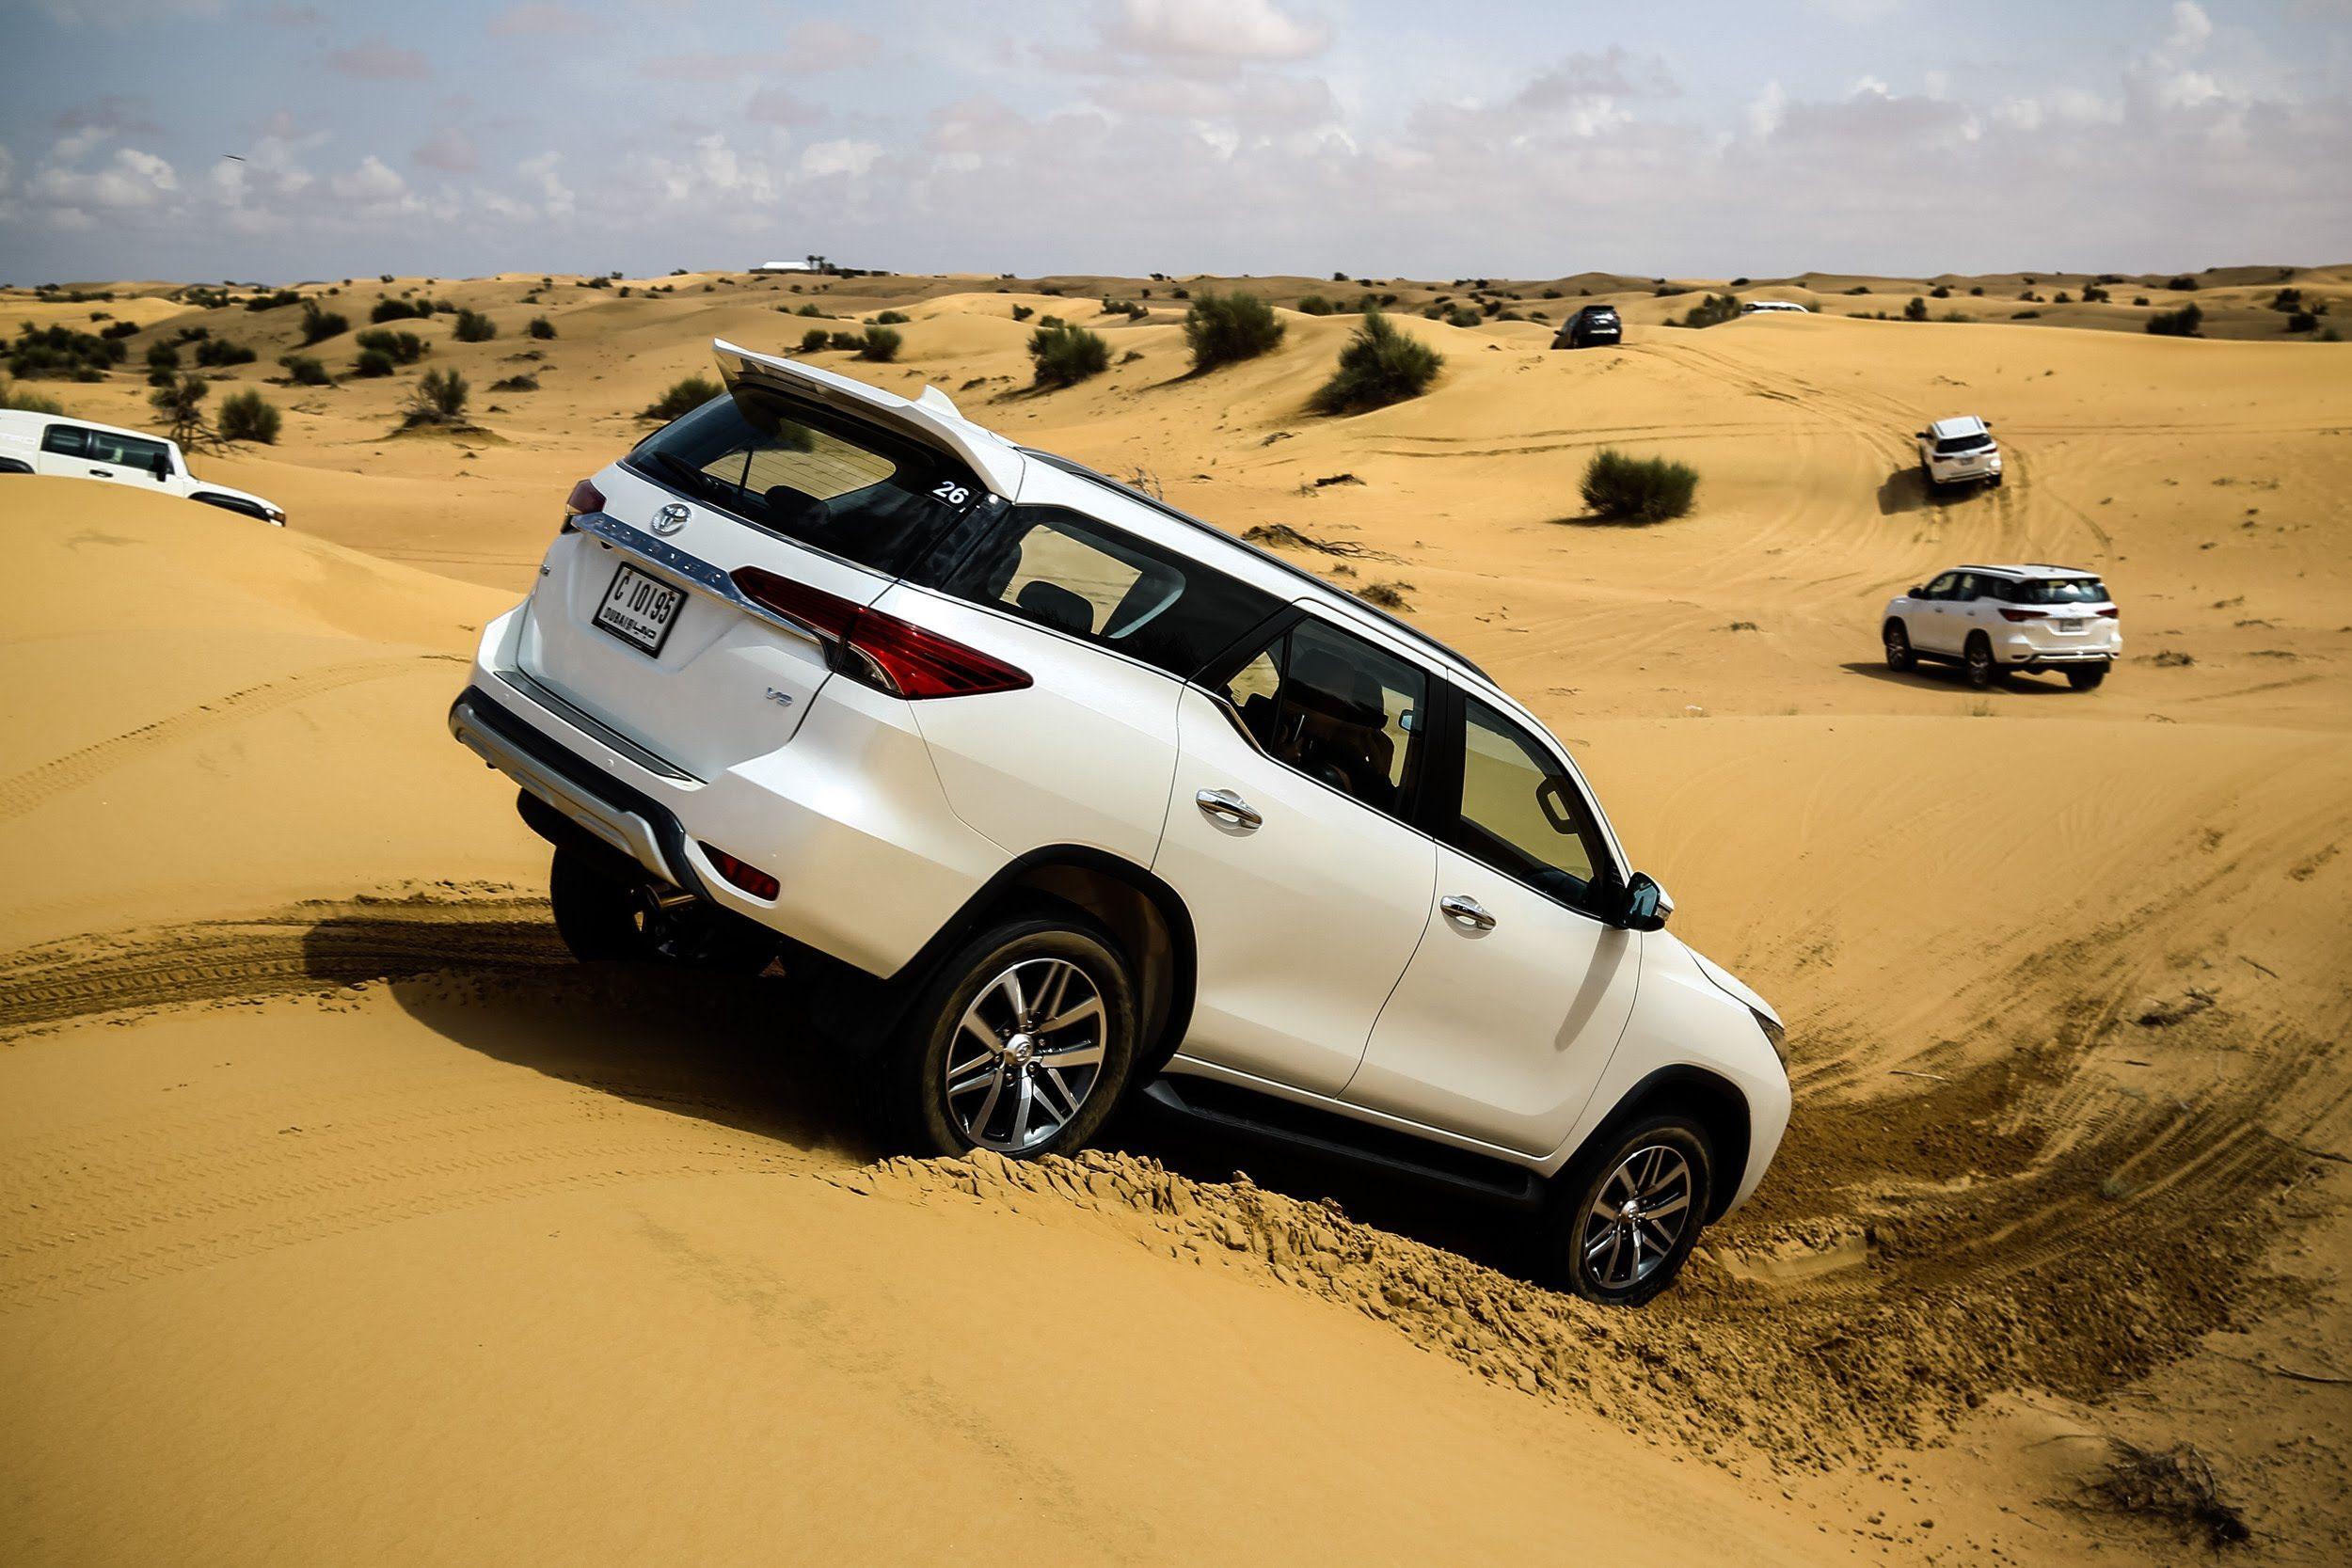 Cars Best Images Of Desert Car Toyota Fortuner All Sports Cars Toyota Images Of Desert